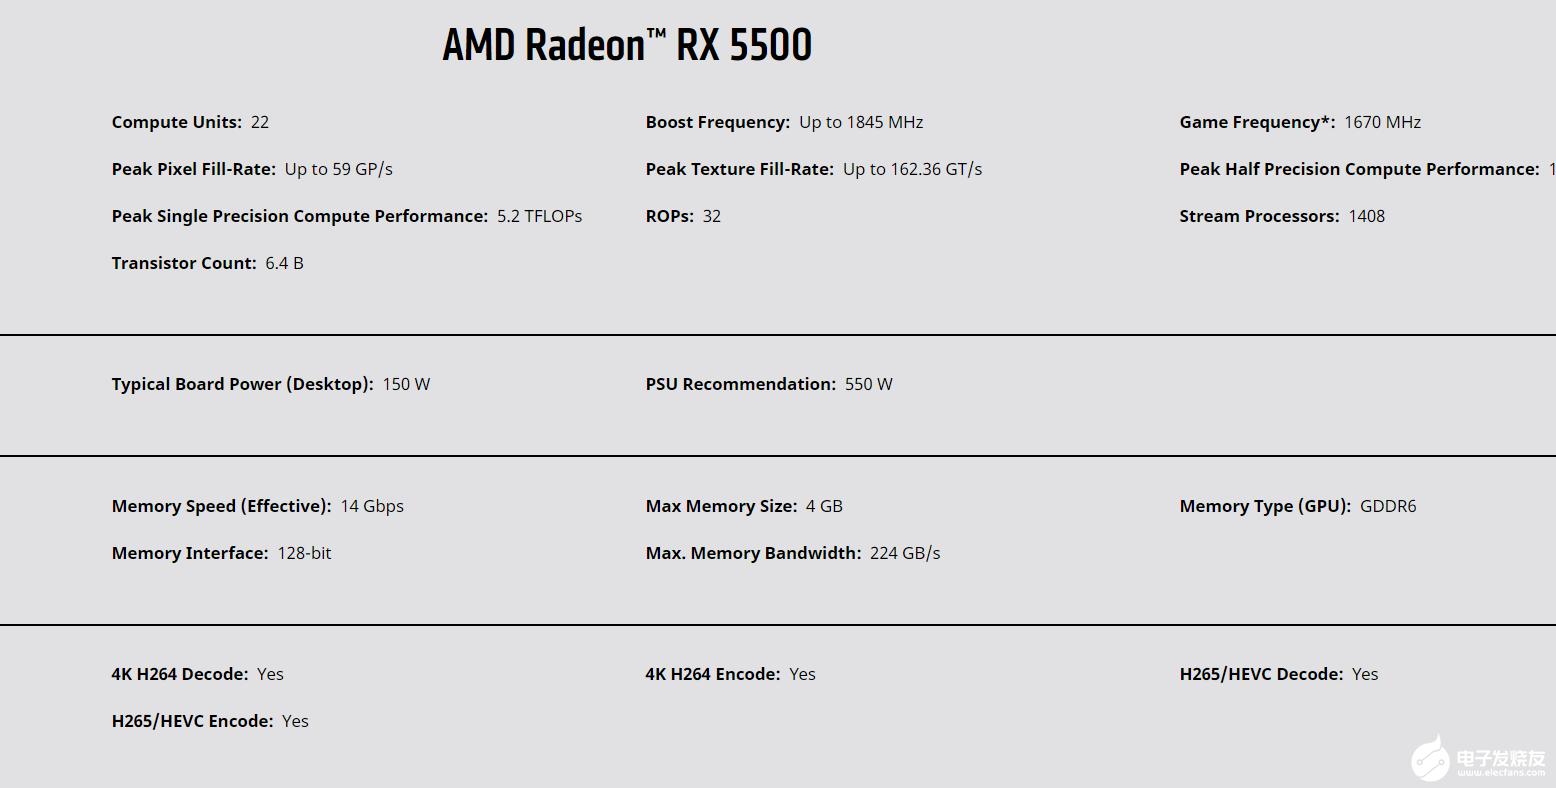 MD RX 5500XT显卡发售,搭载22组计算单元与1408流处理器